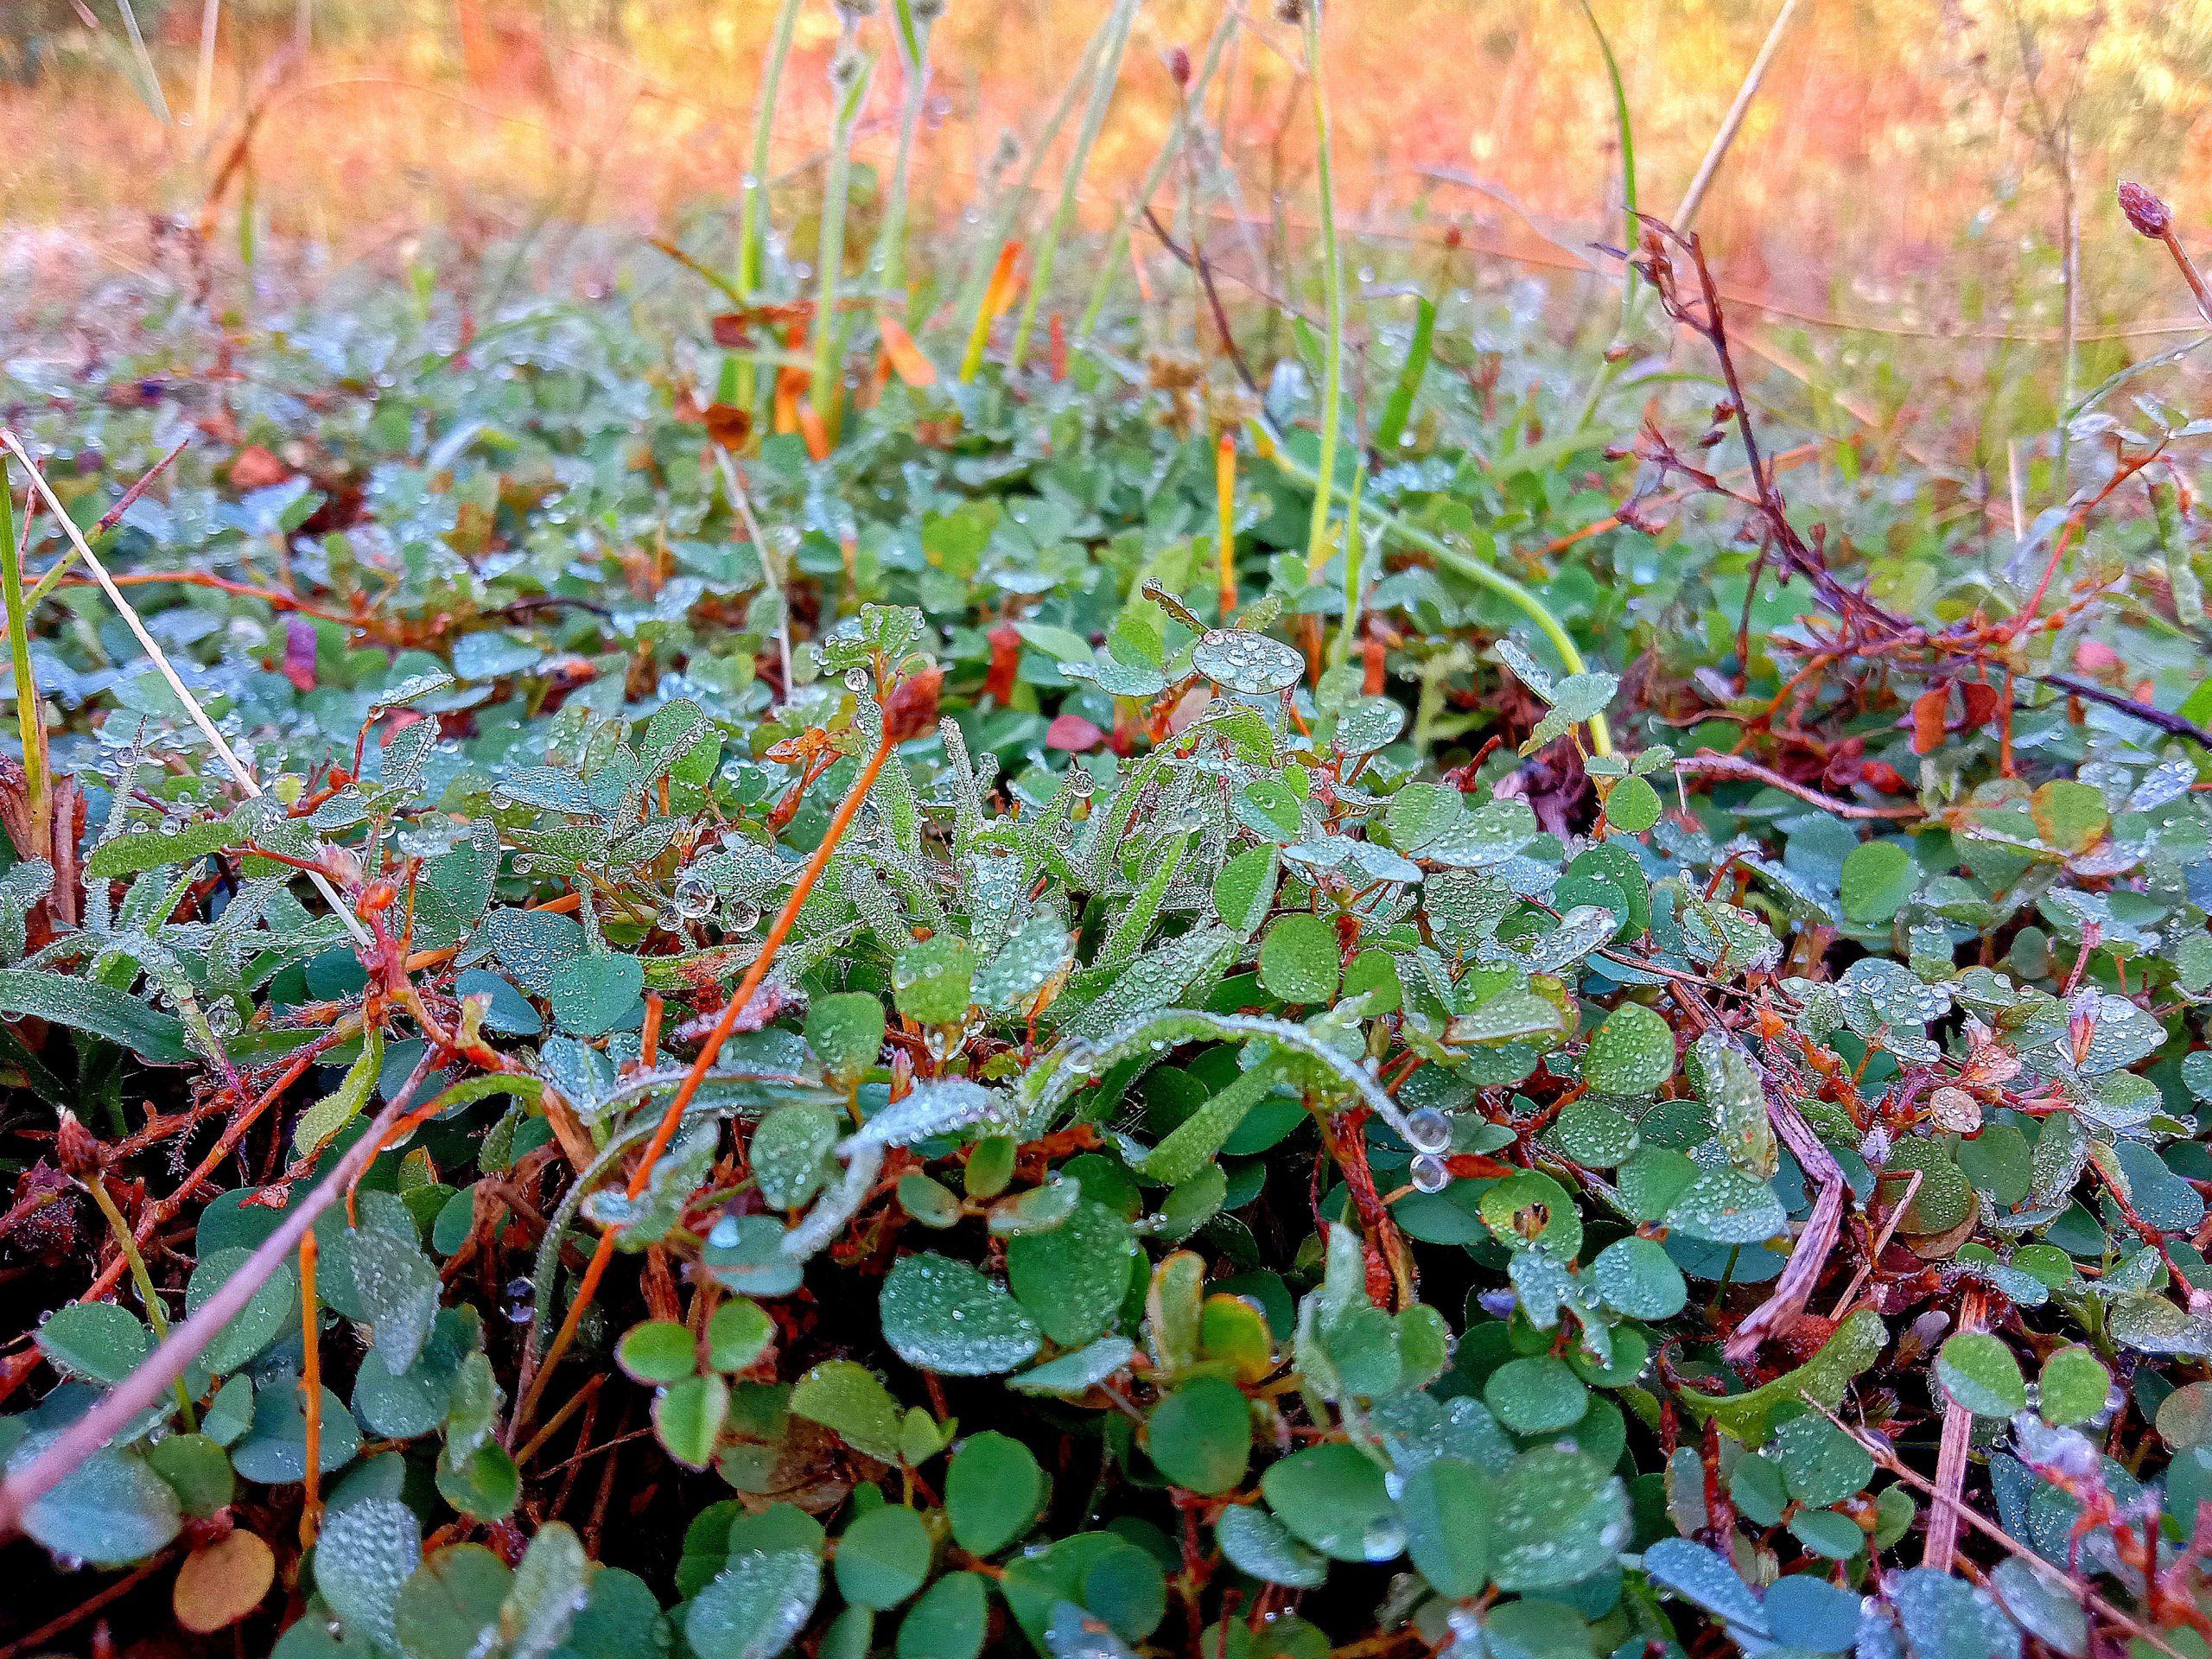 Dew on grass in farm